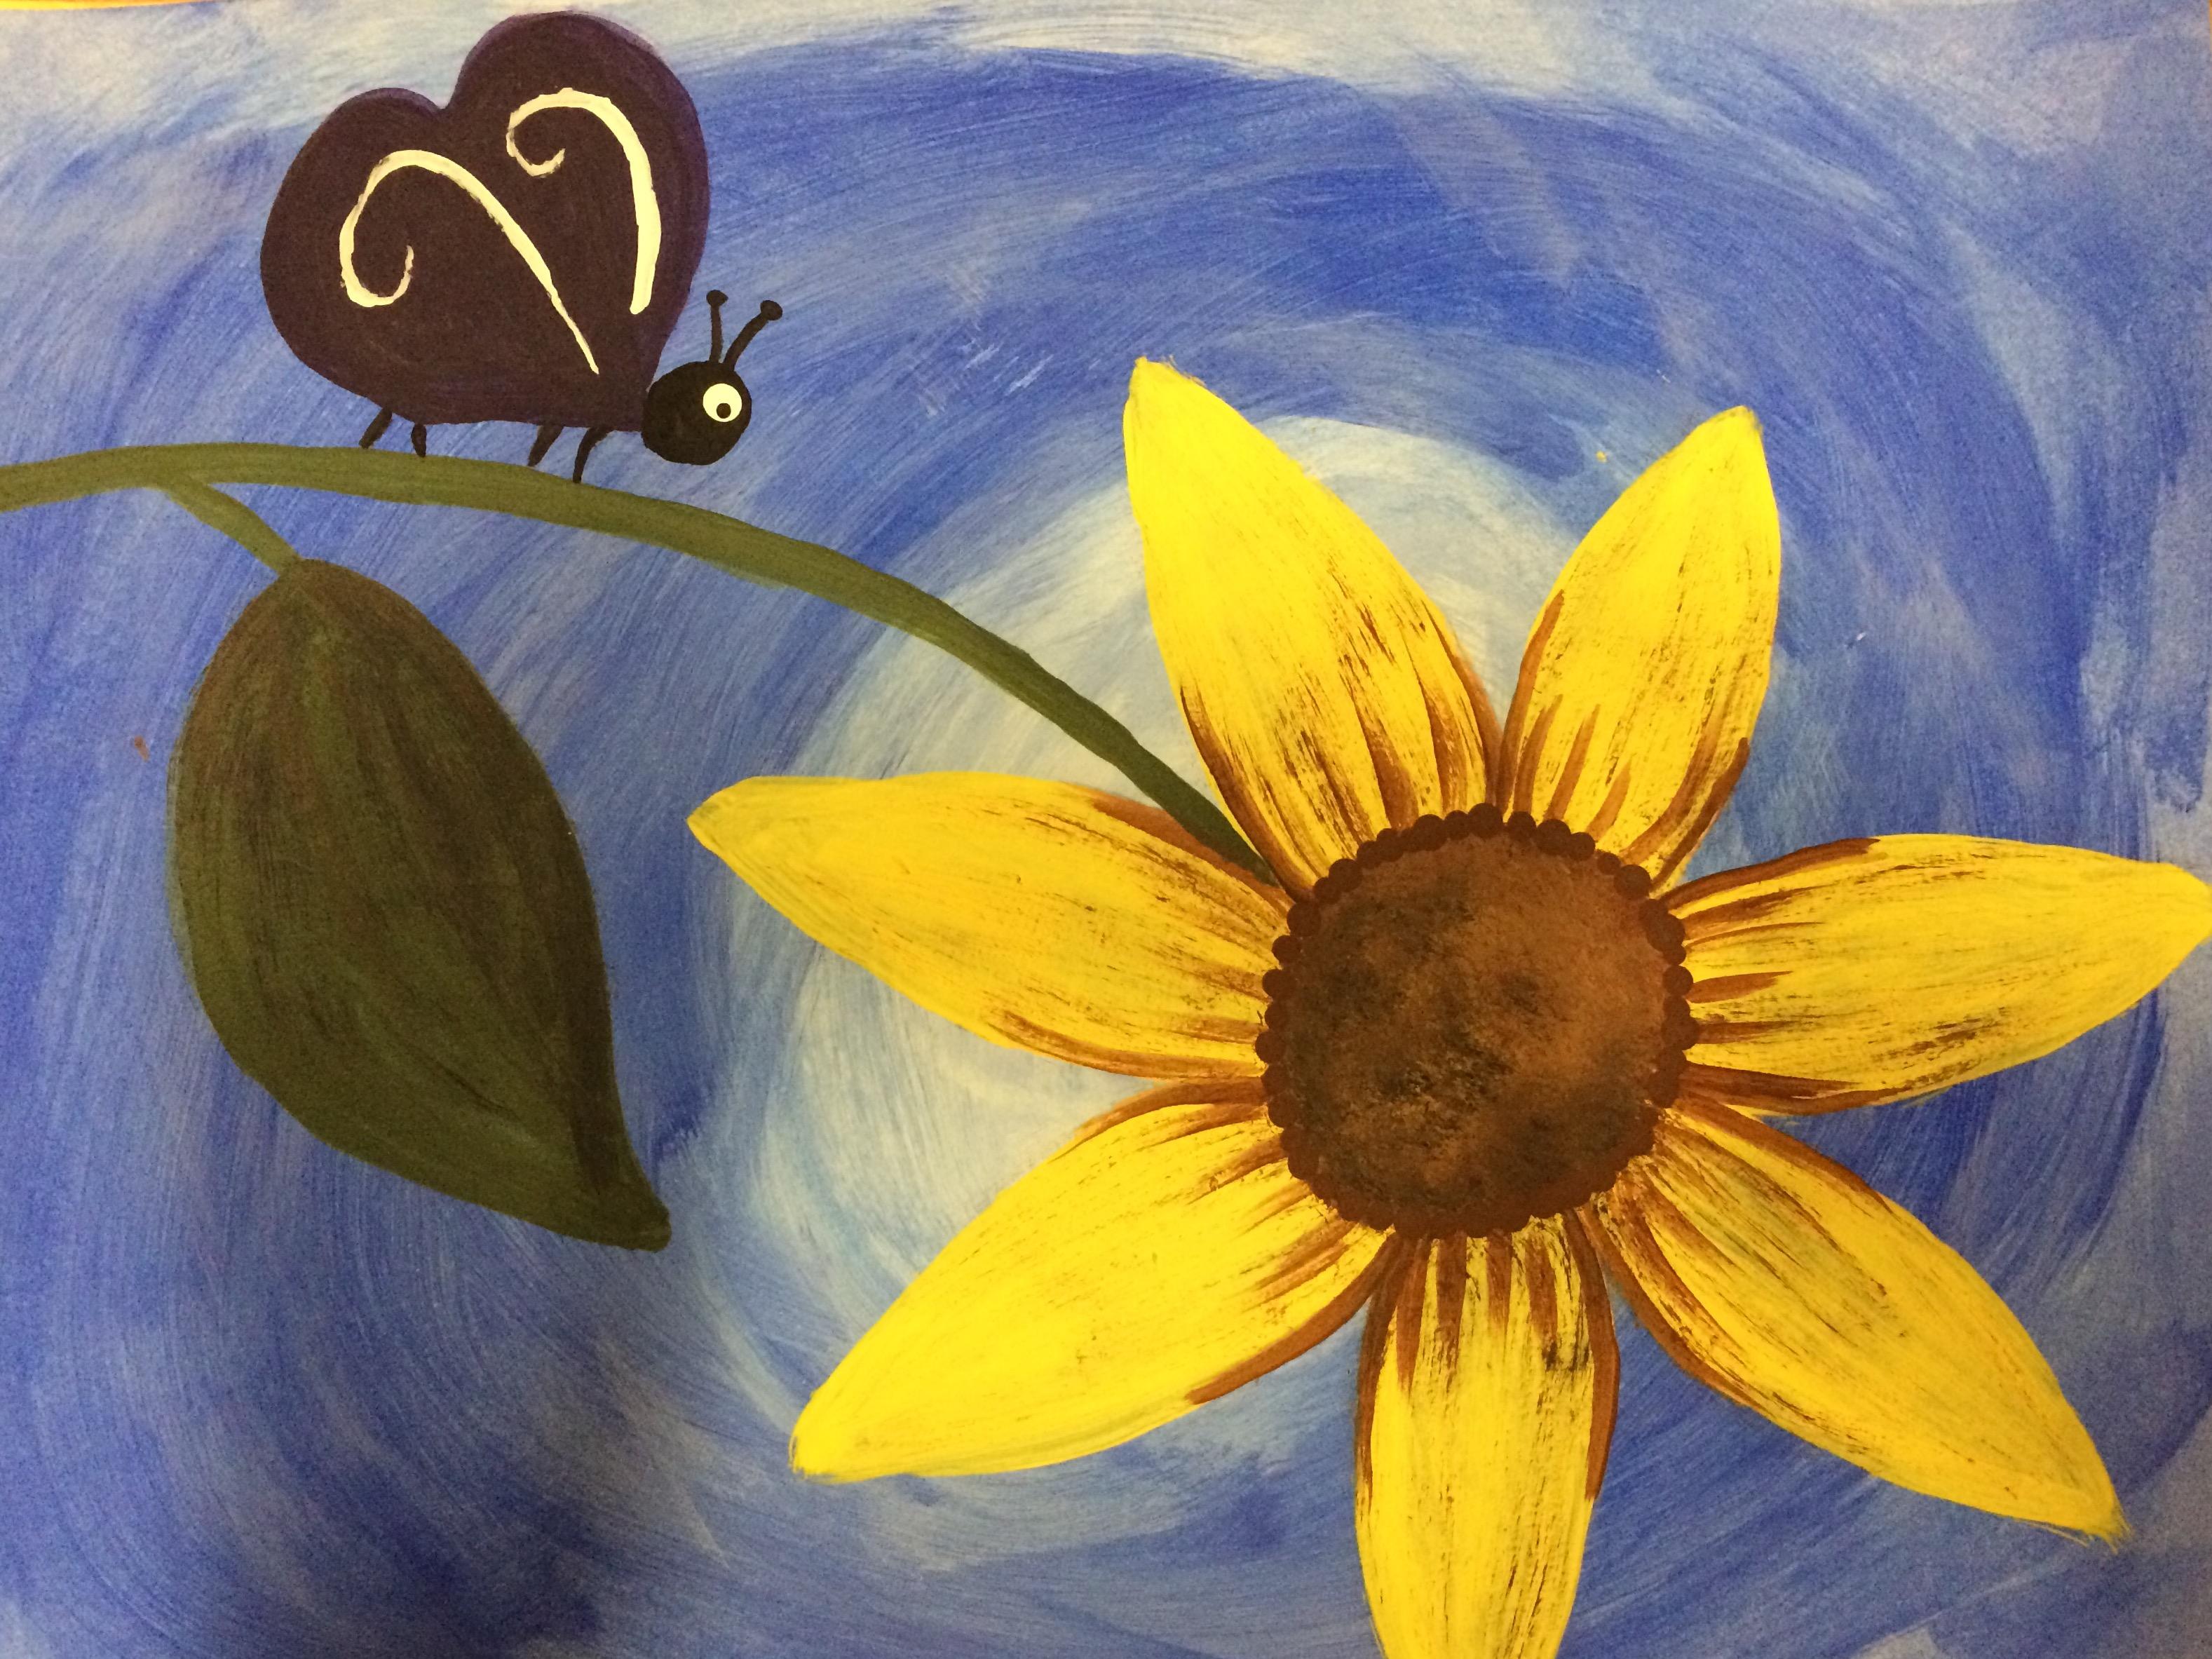 Bug & Sunflower